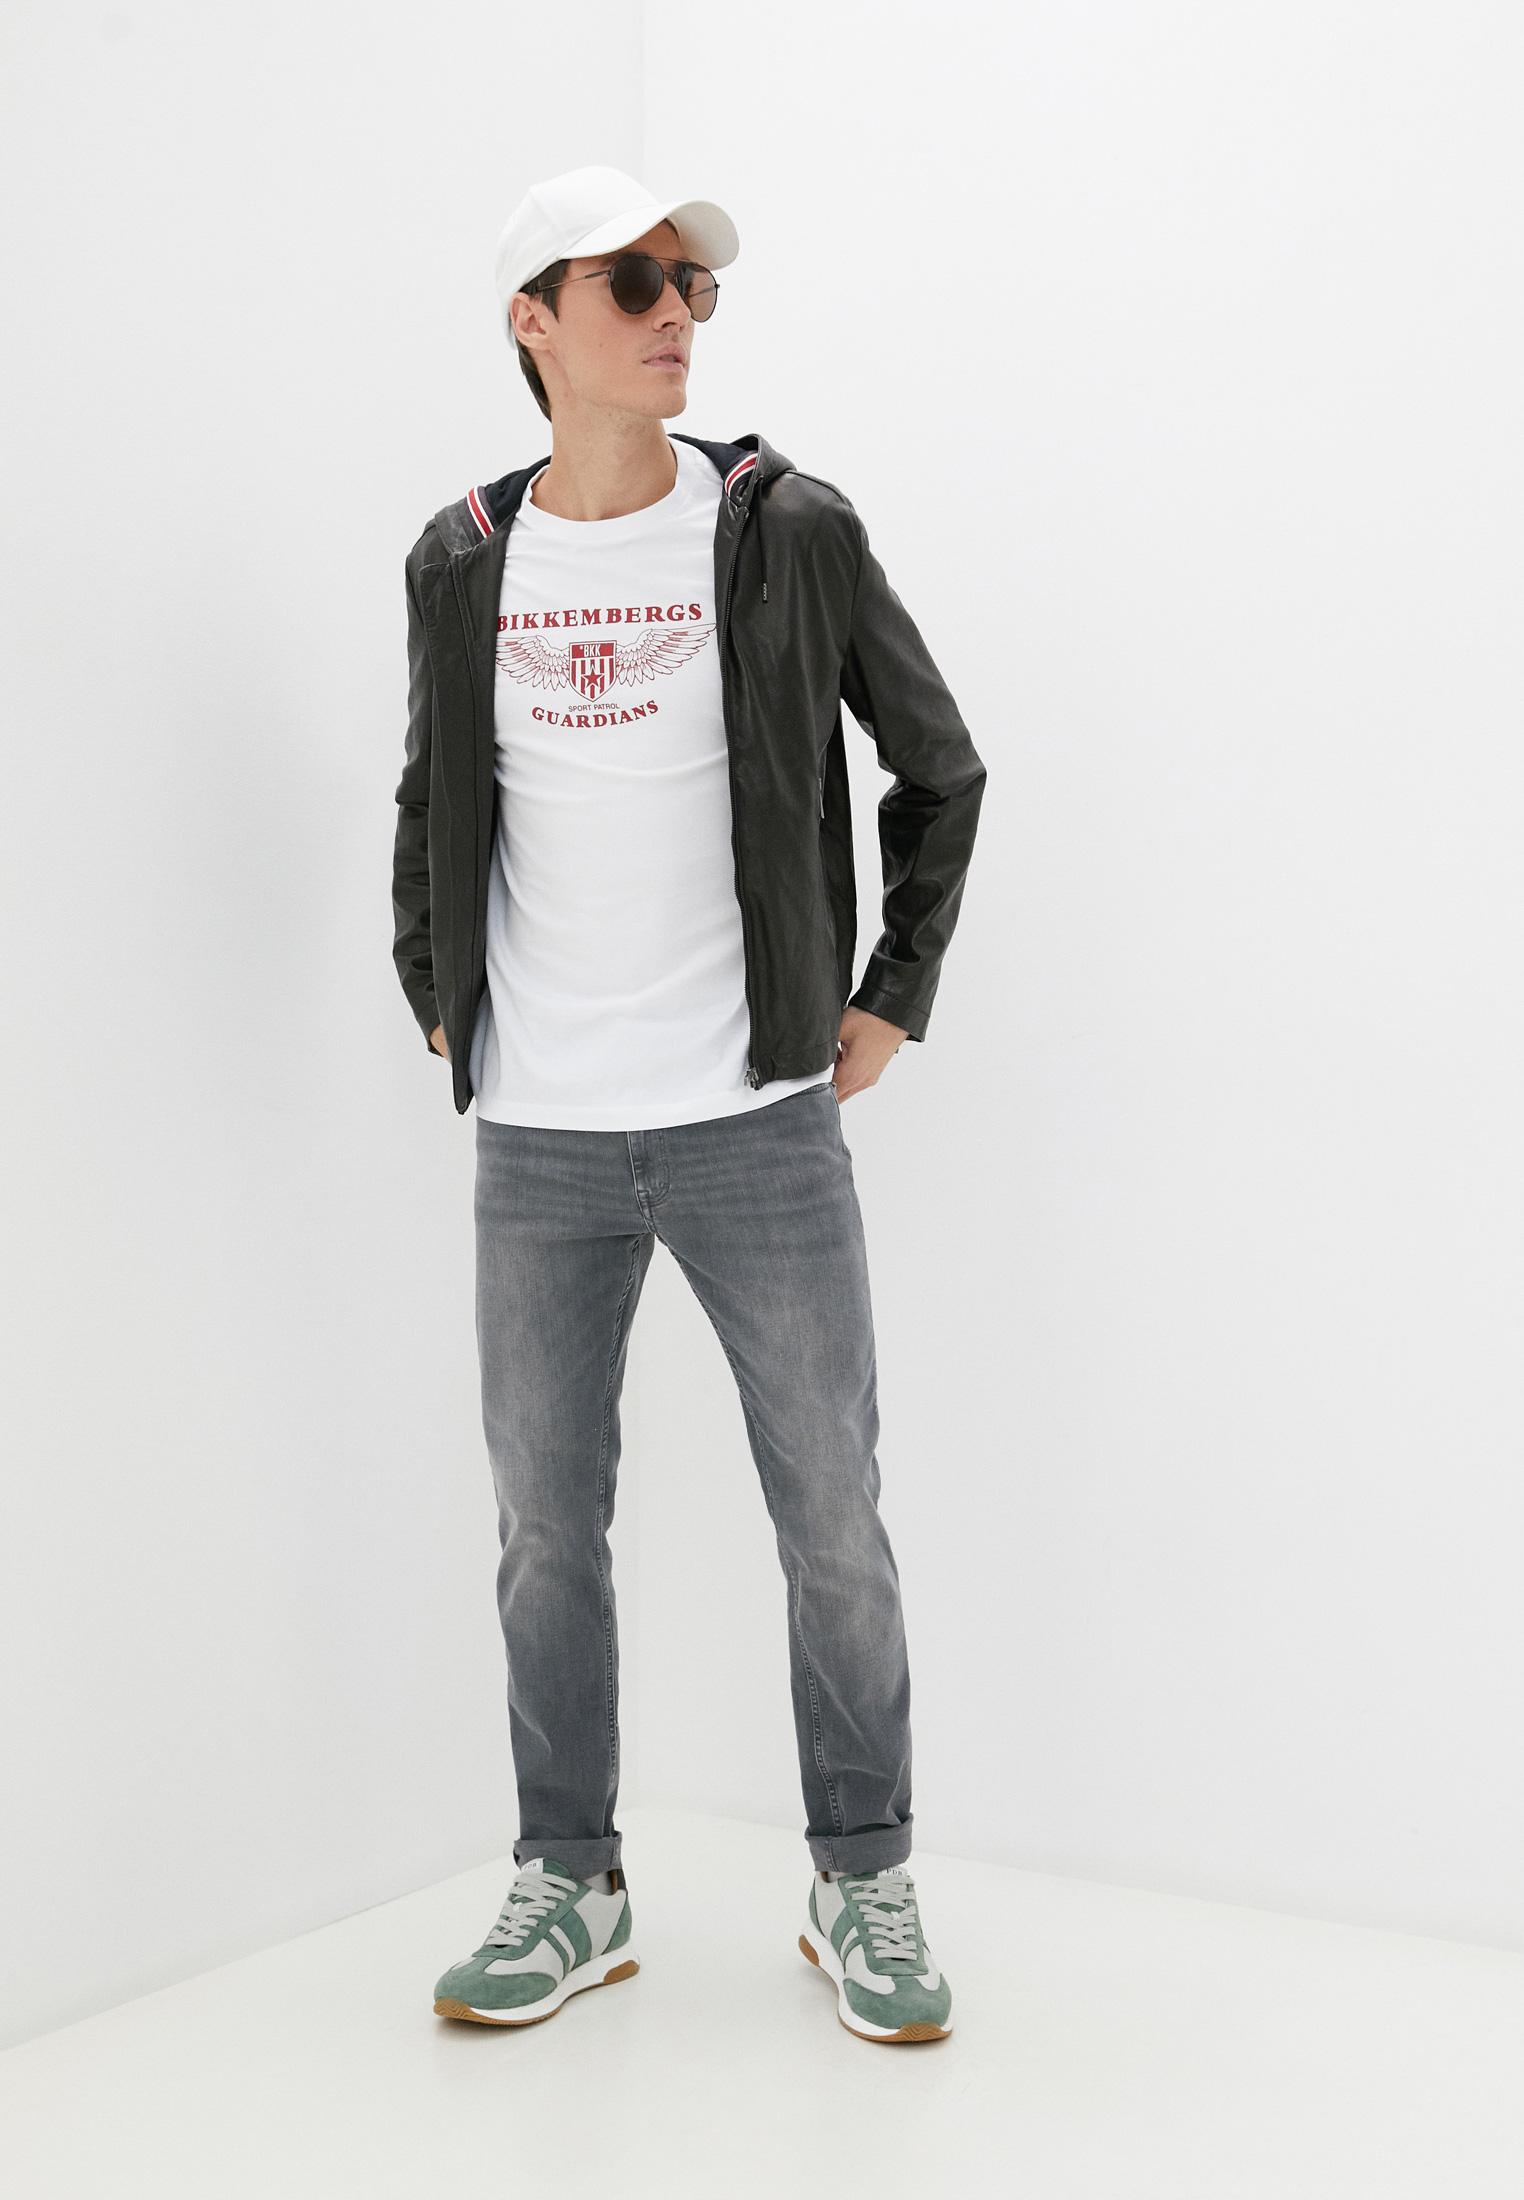 Кожаная куртка Bikkembergs (Биккембергс) C H 201 00 D 1197: изображение 3